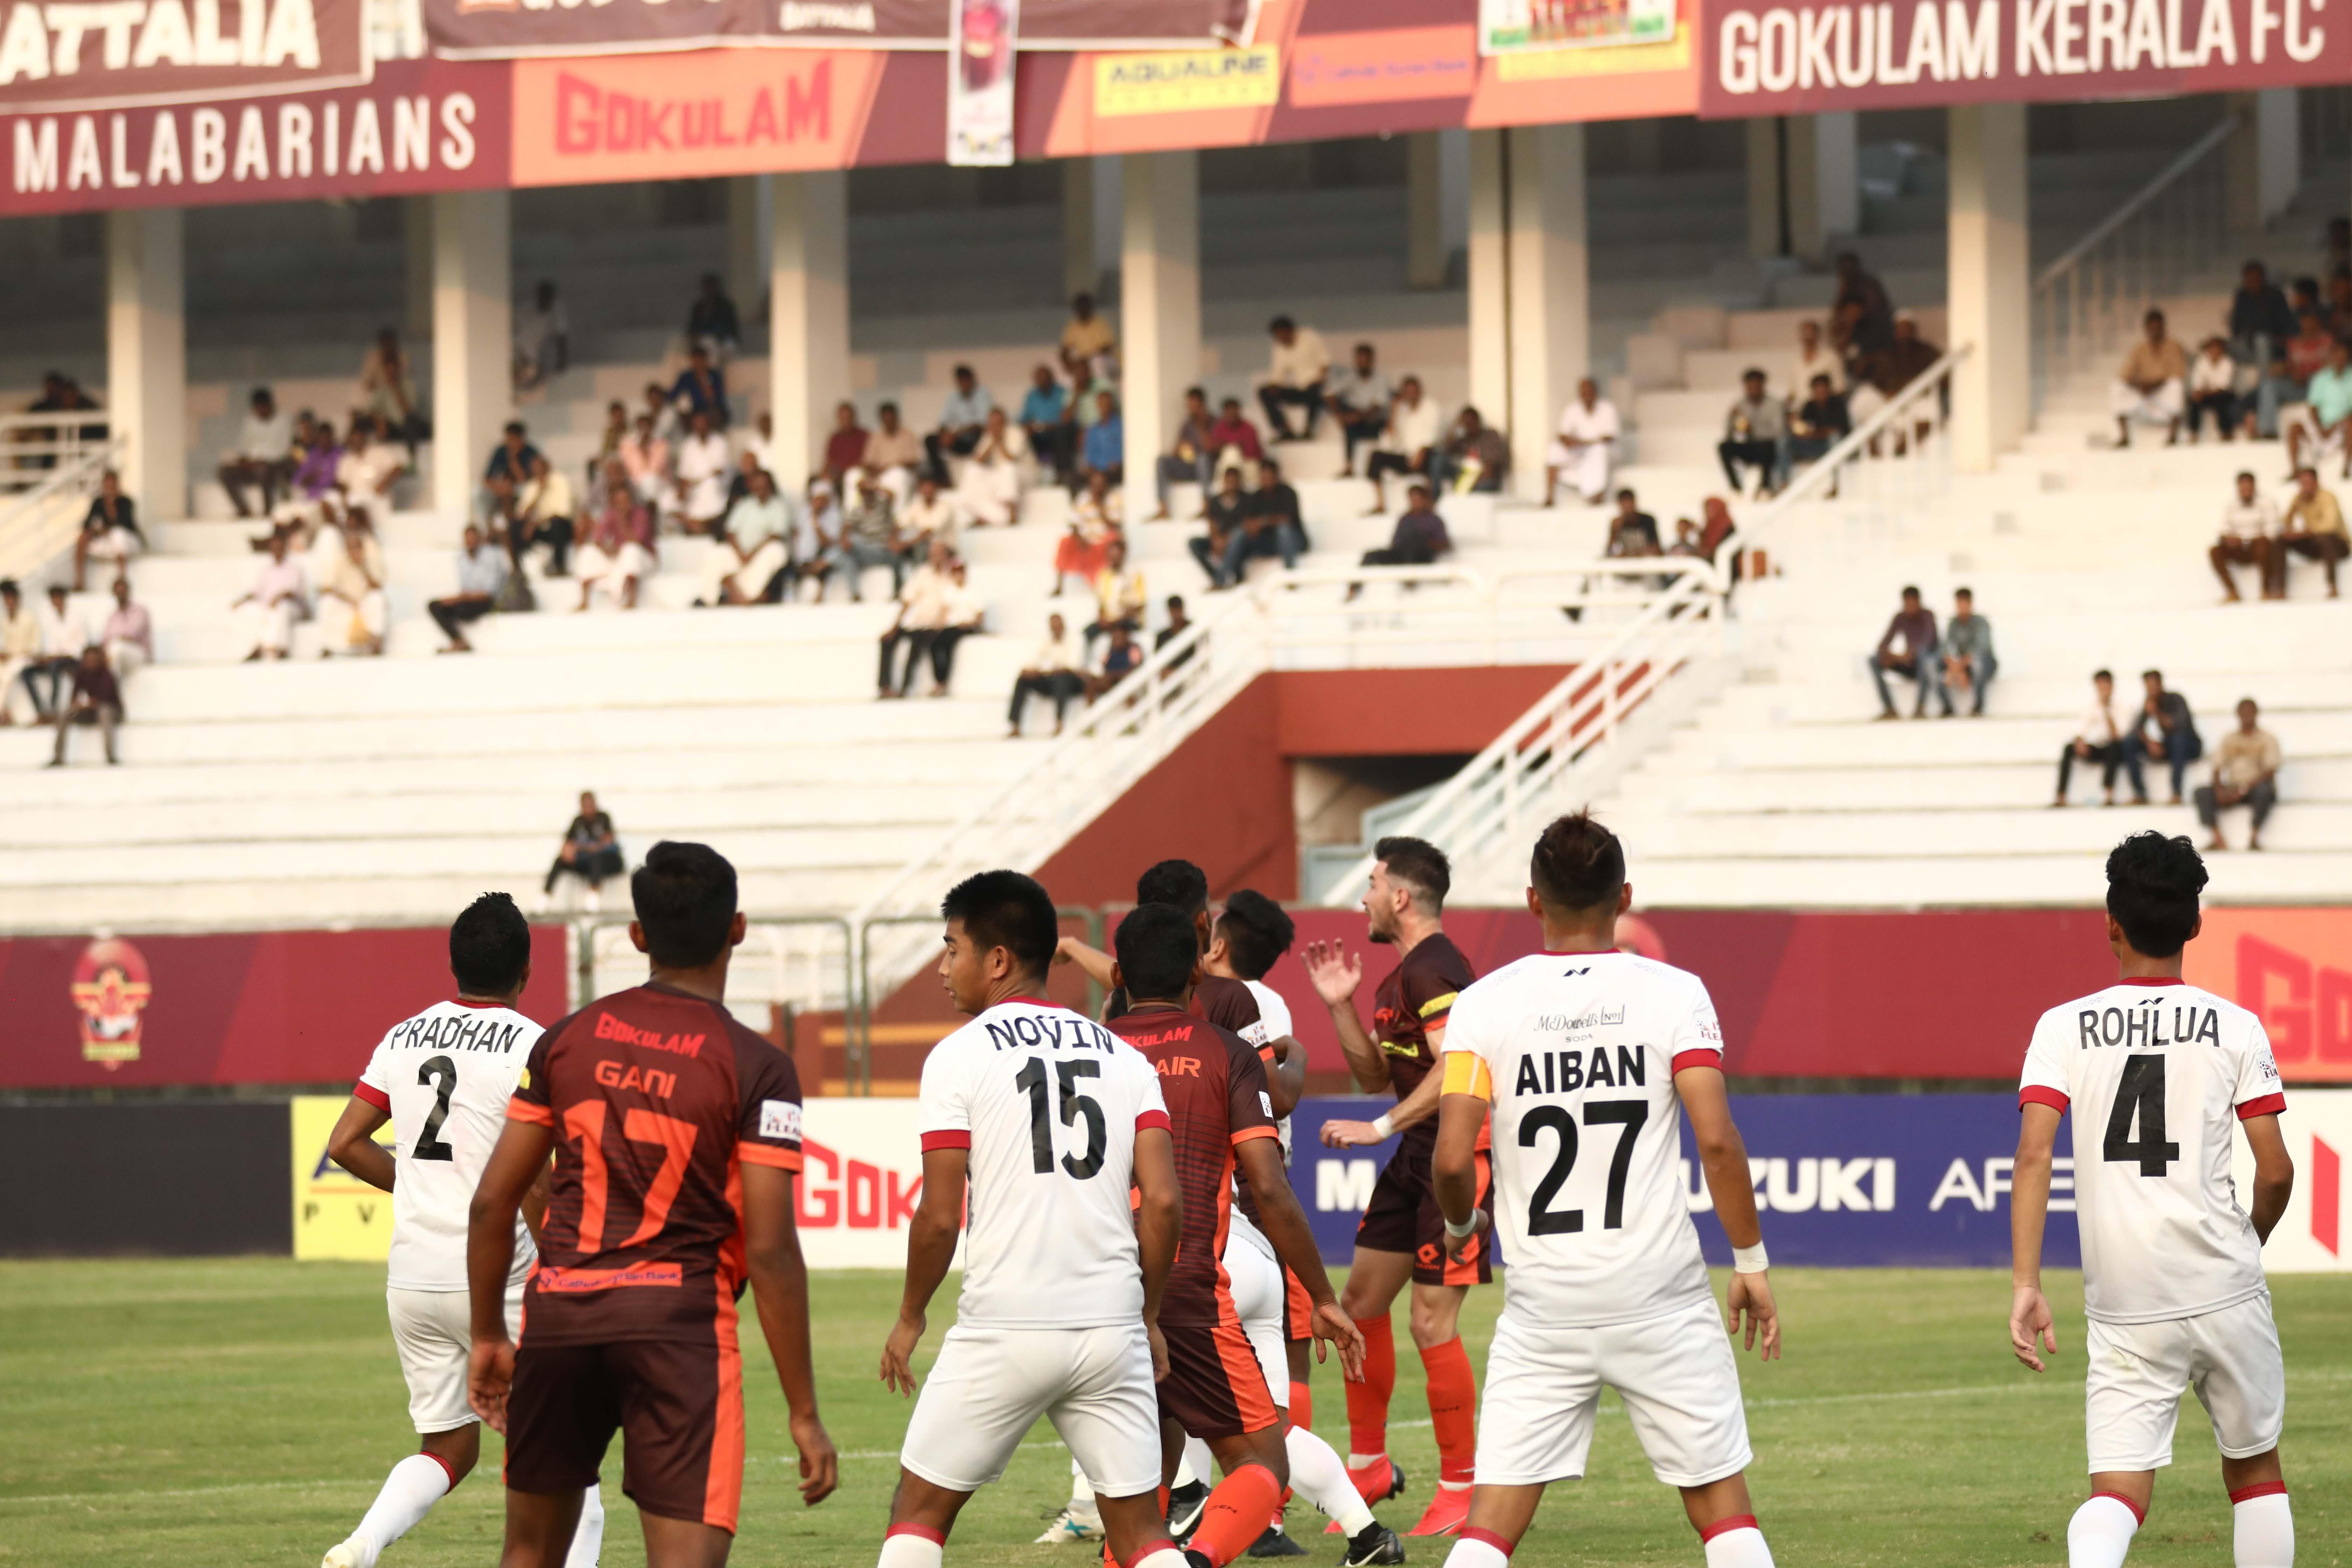 Gokulam Kerala vs Lajong